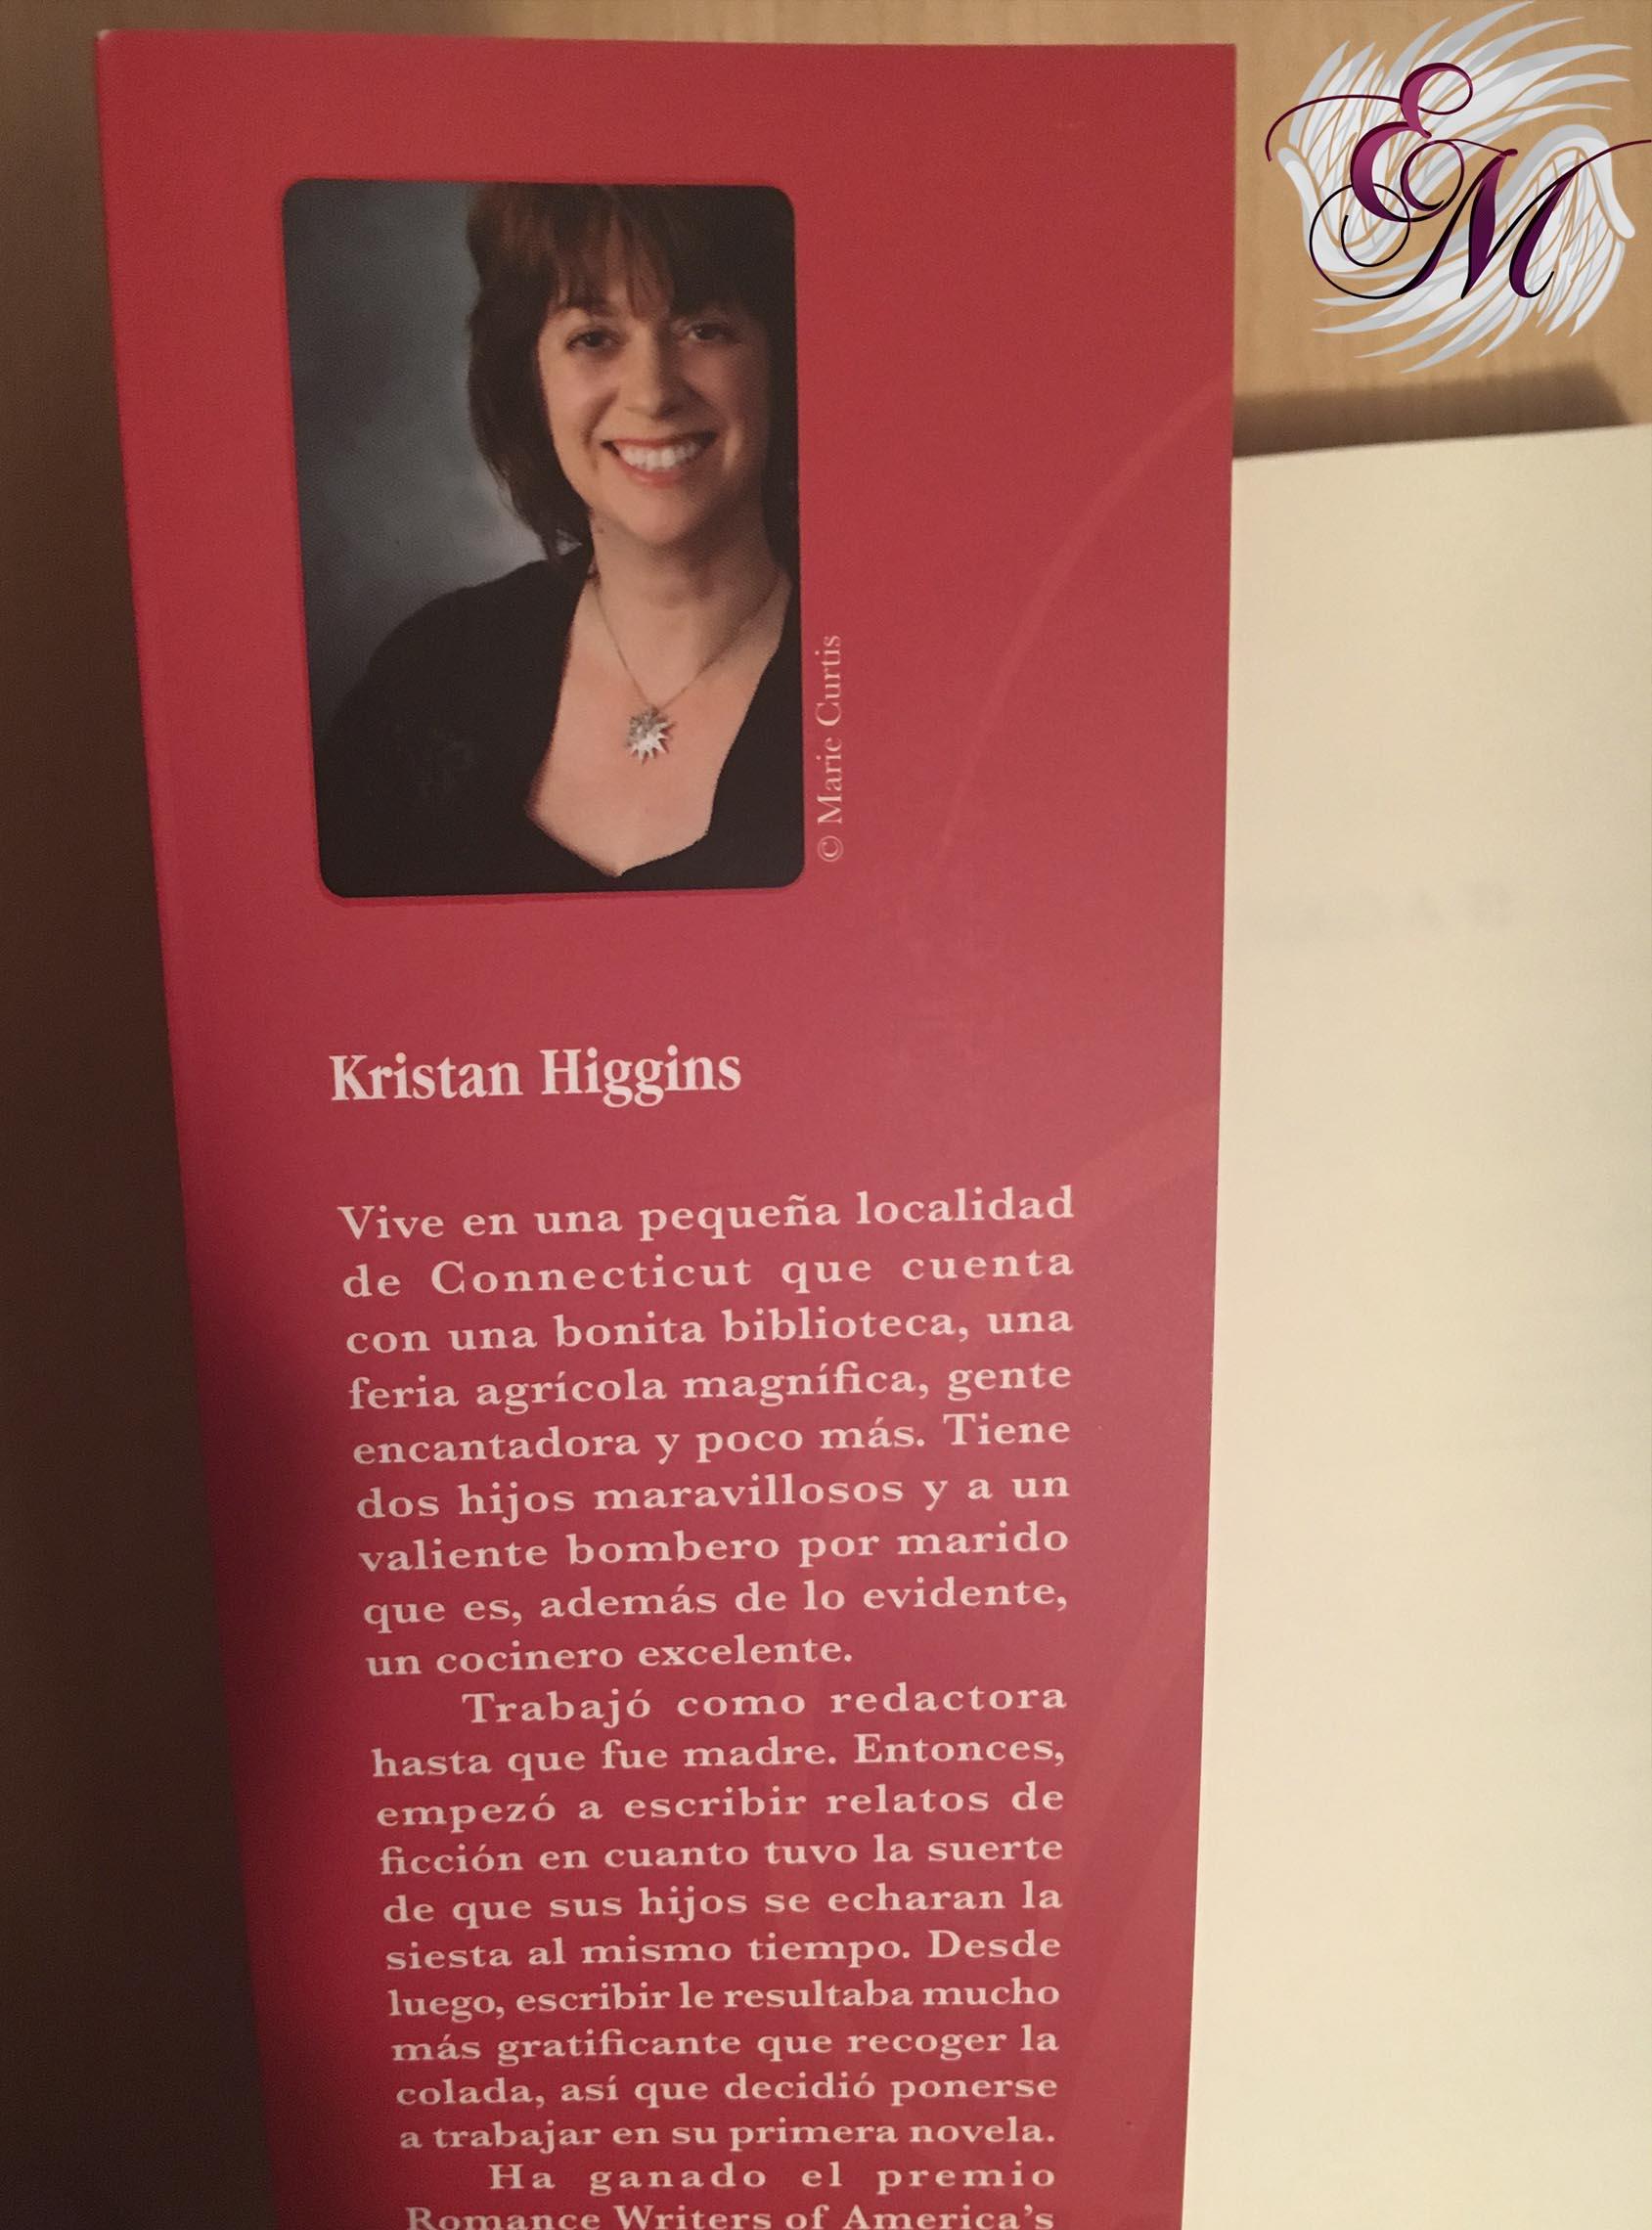 Te esperaré solo a ti, de Kristan Higgins - Reseña